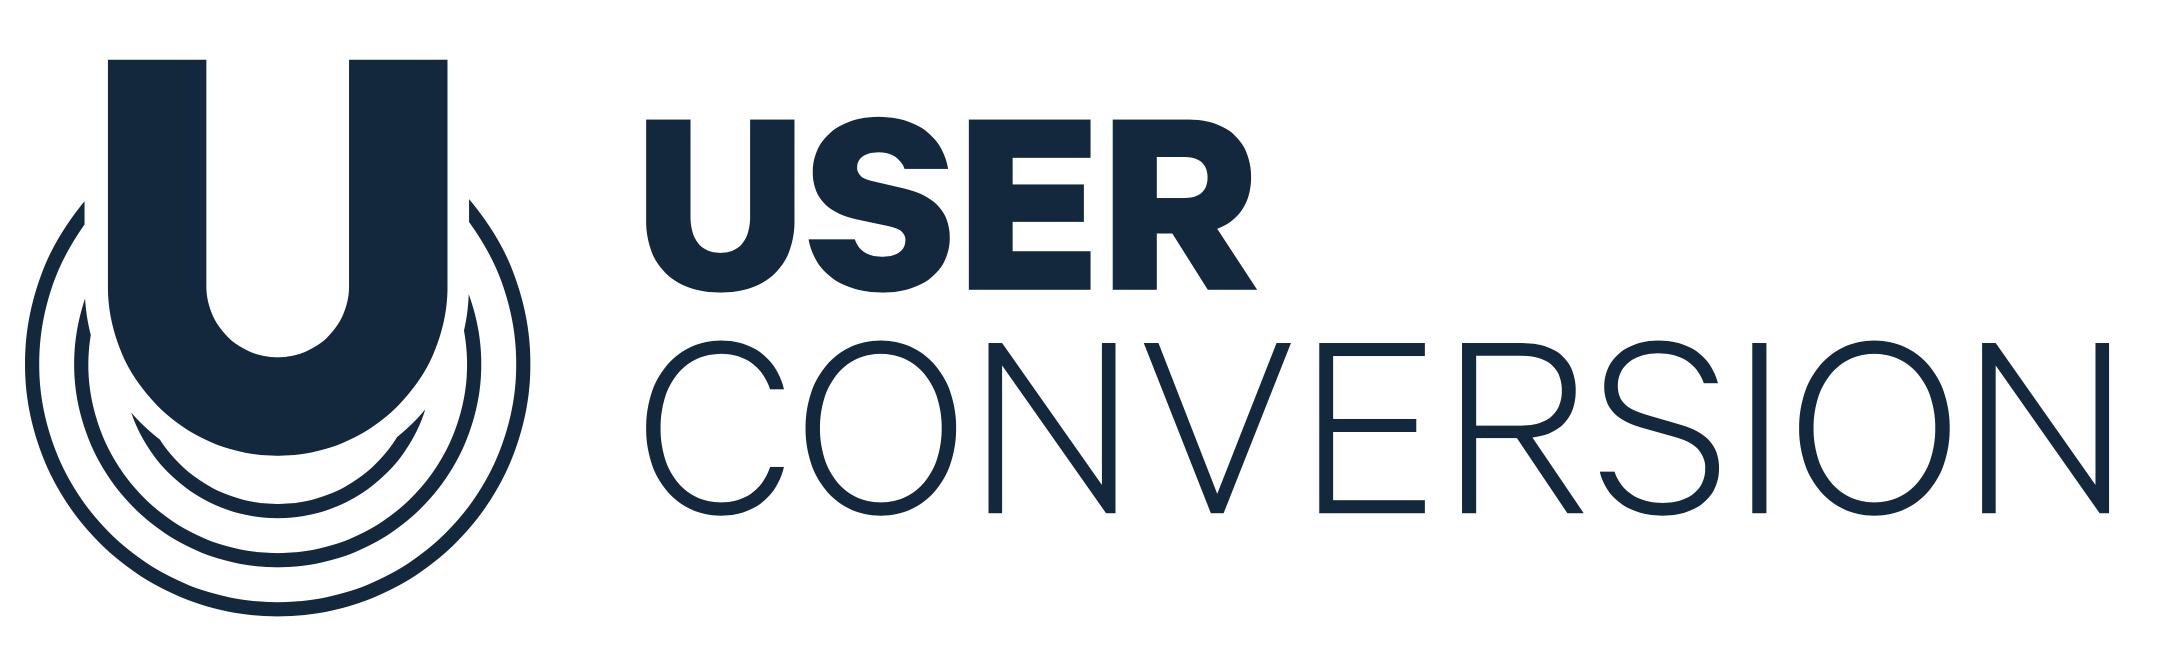 User conversion logo